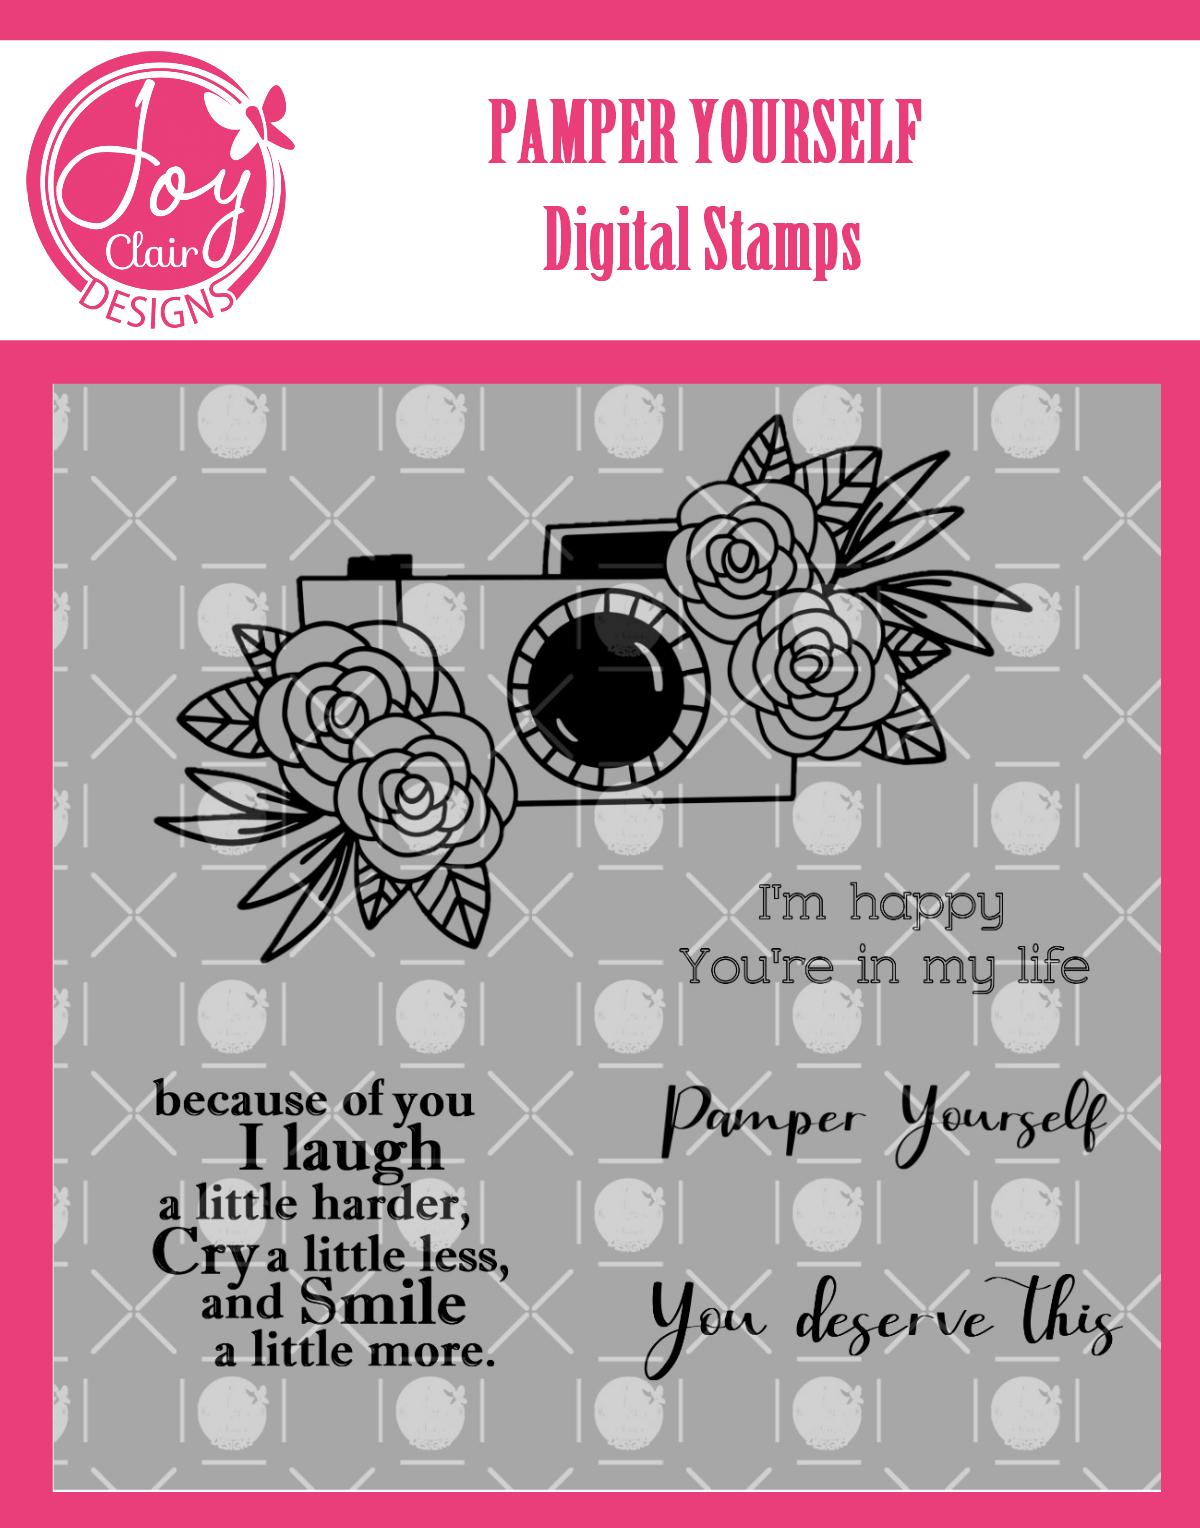 Joy Clair - Pamper Yourself